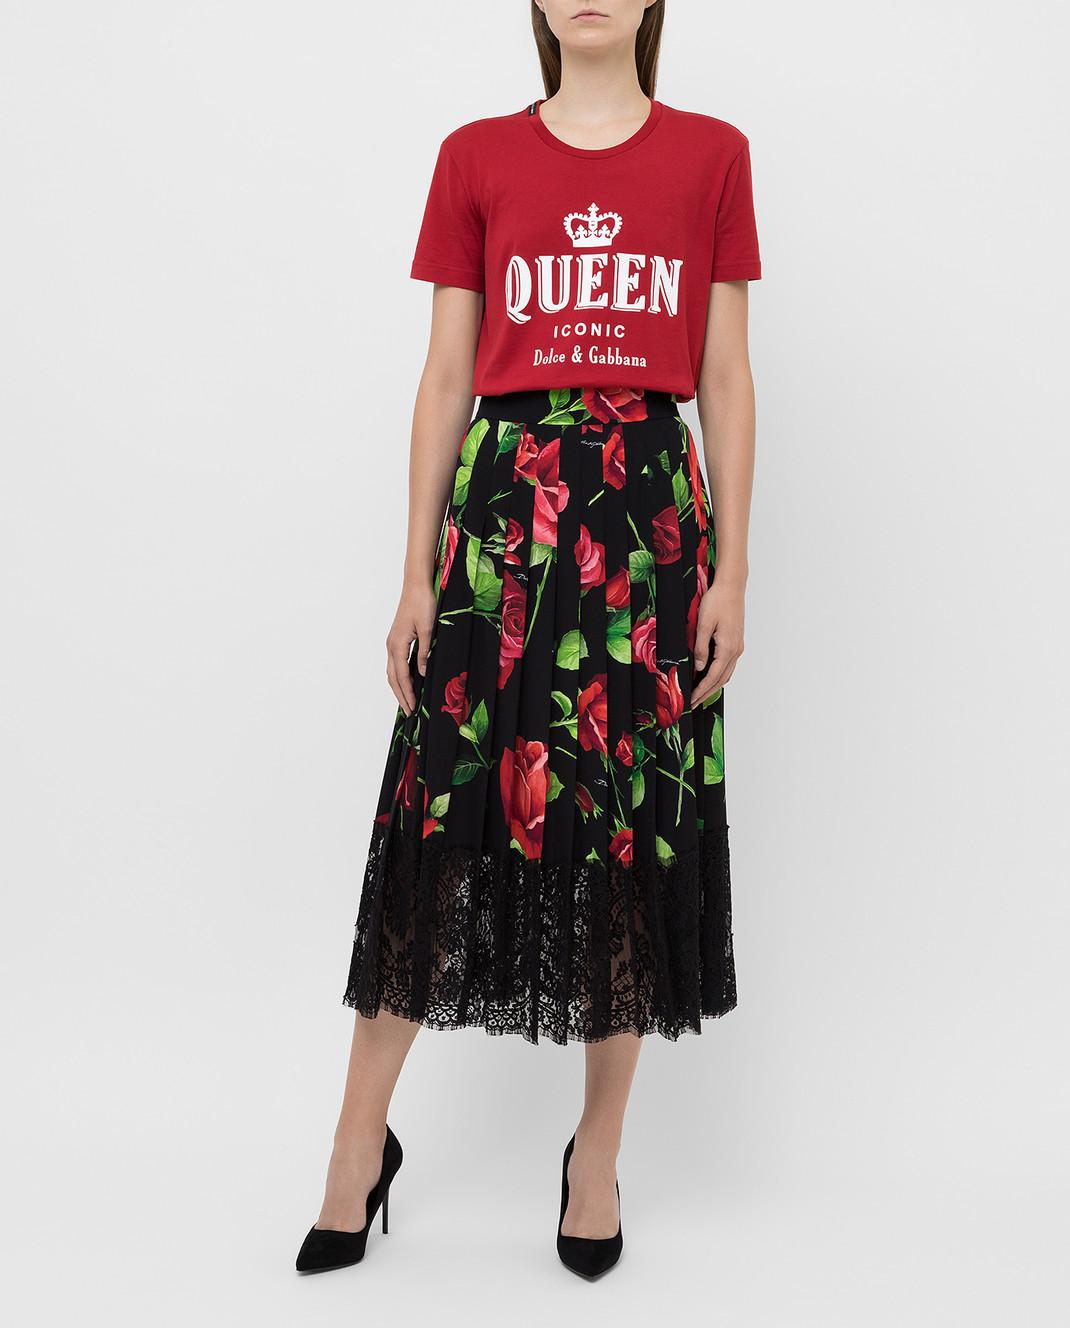 Dolce&Gabbana Черная юбка из шелка F4BFTTFSAY1 изображение 2